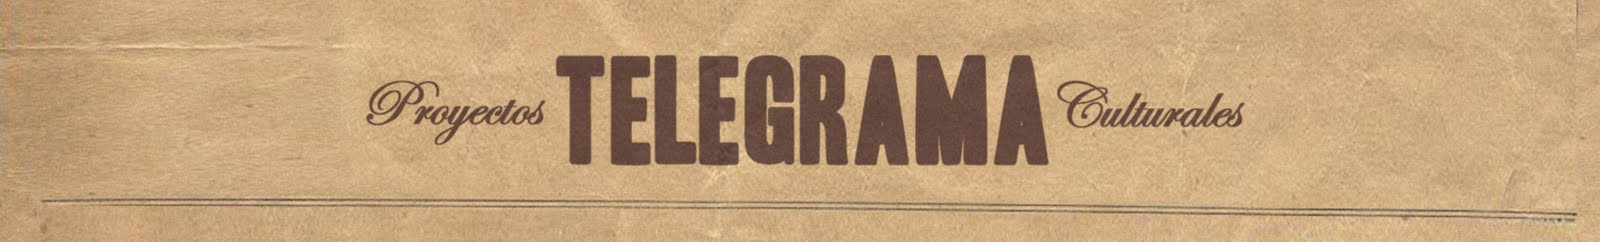 Telegrama Cultural